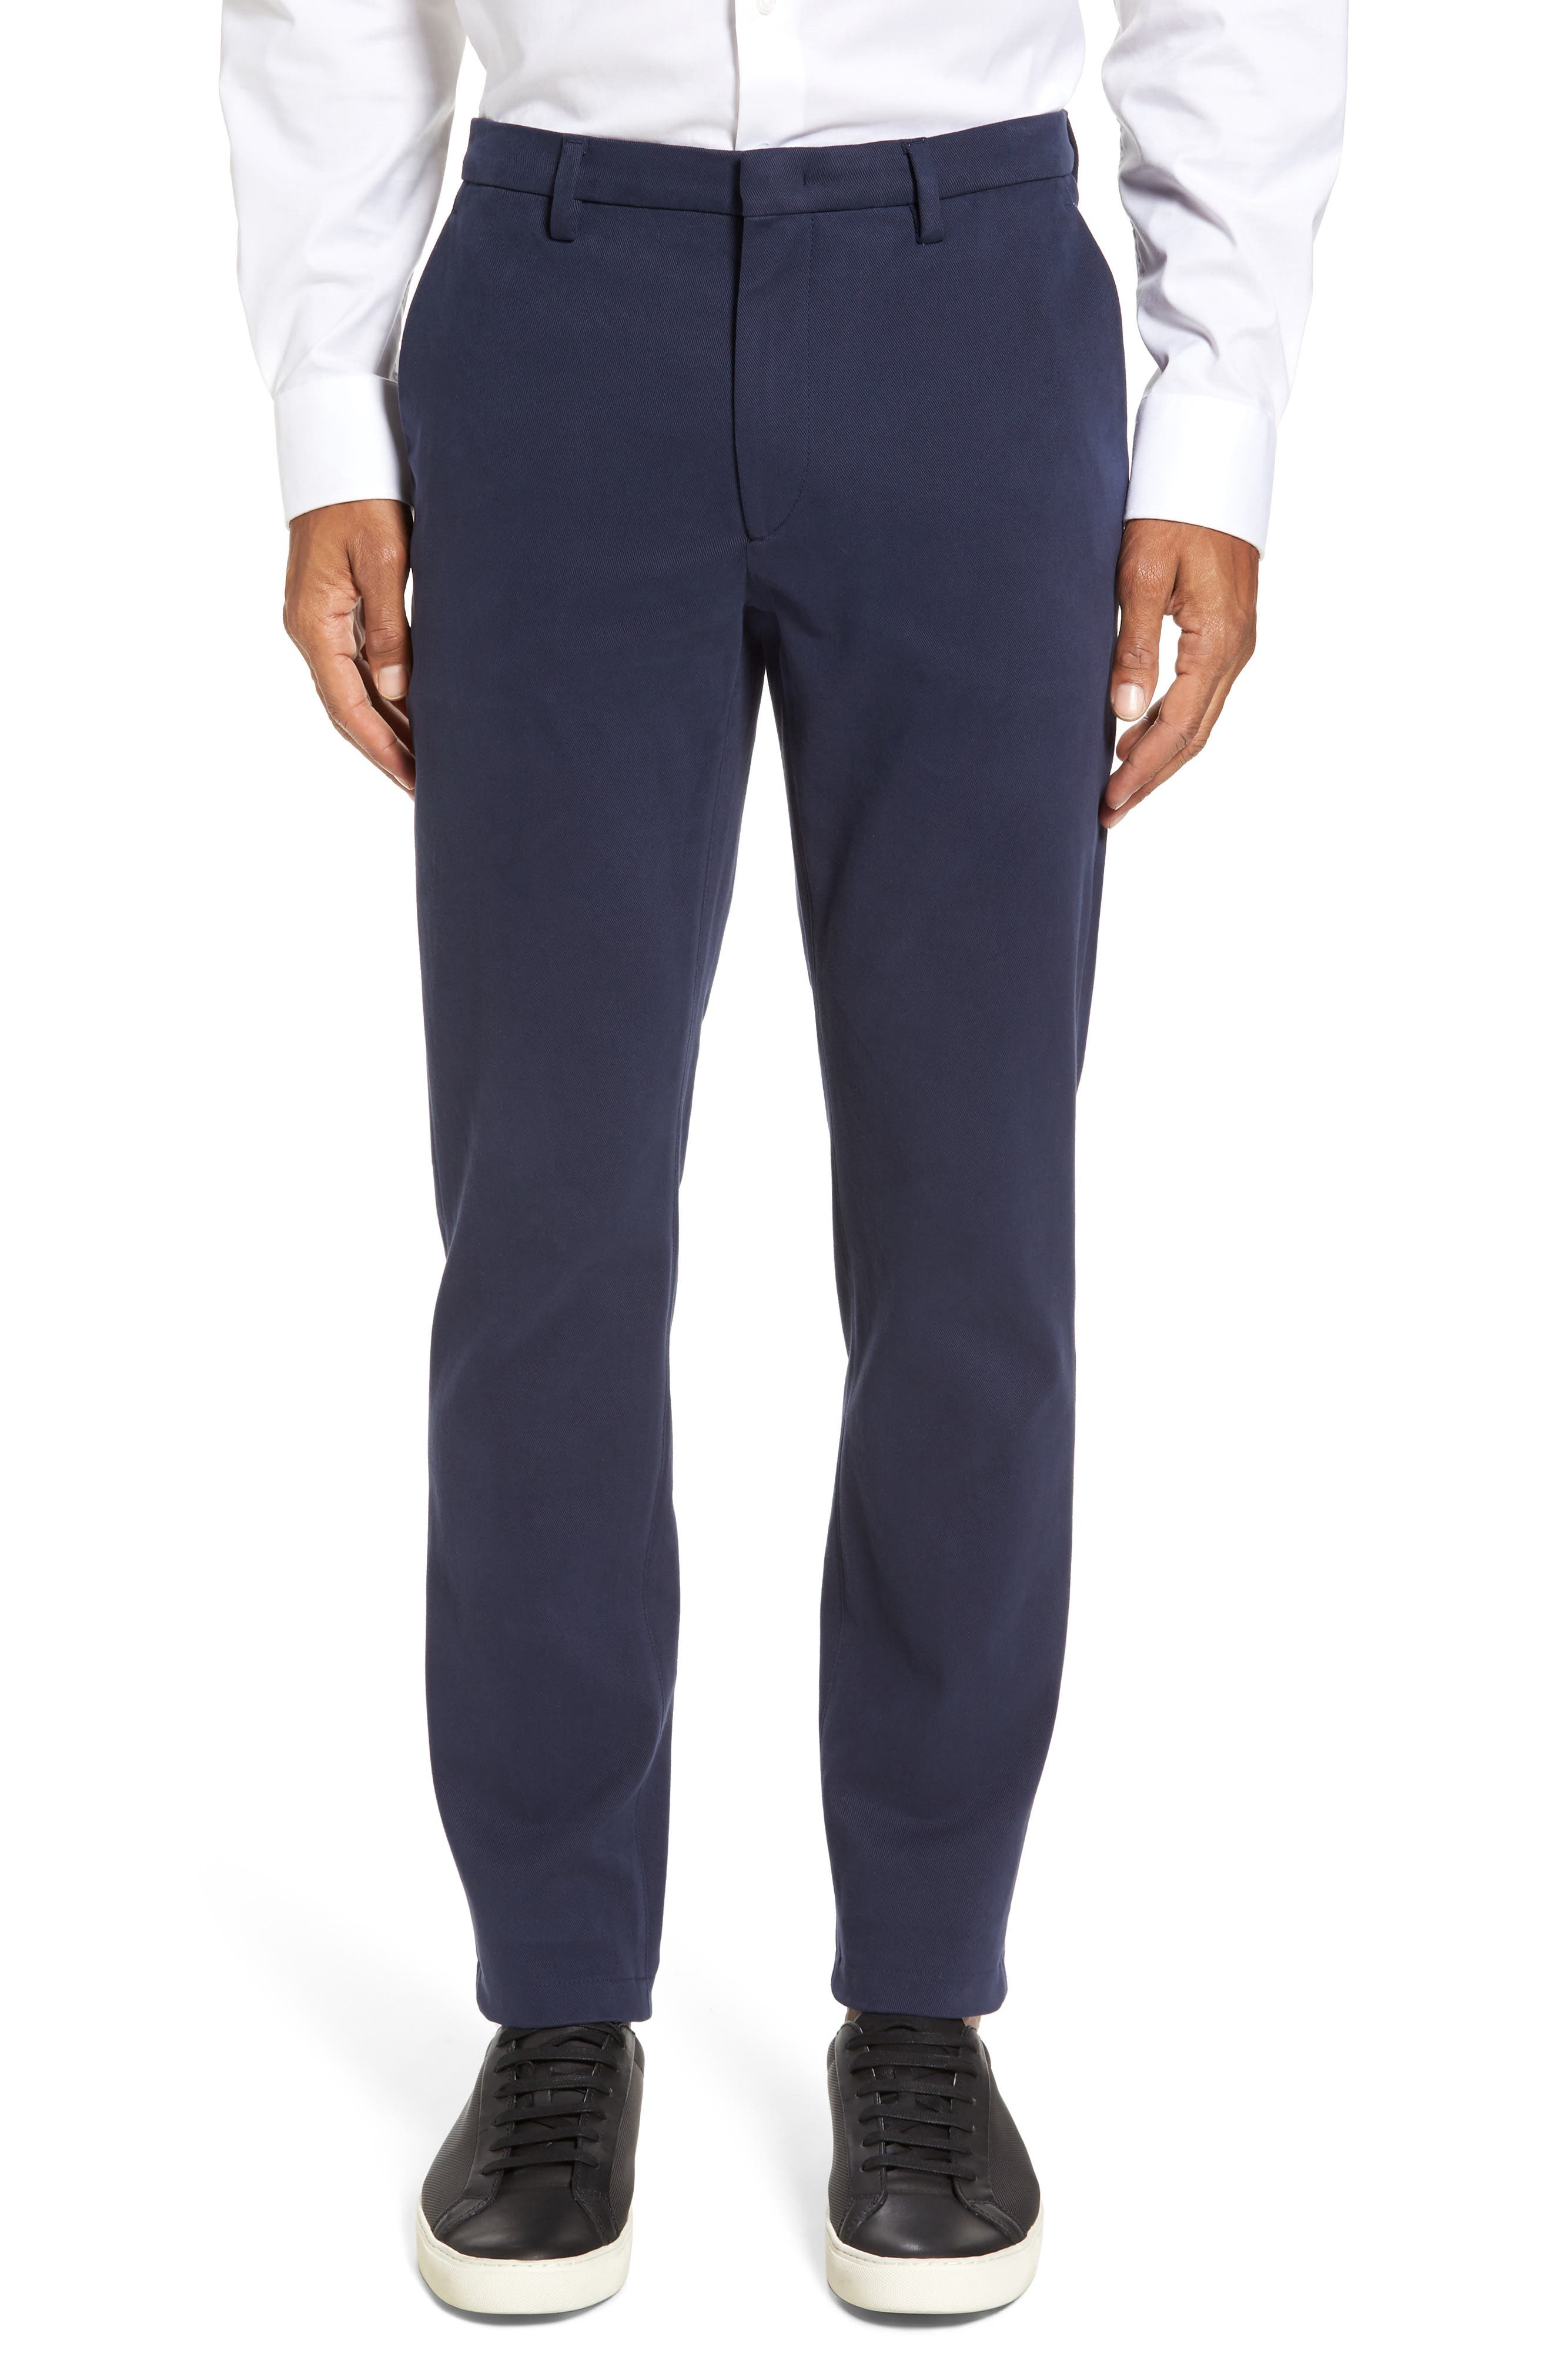 Kaito Stretch Chino Pants,                         Main,                         color, Blue